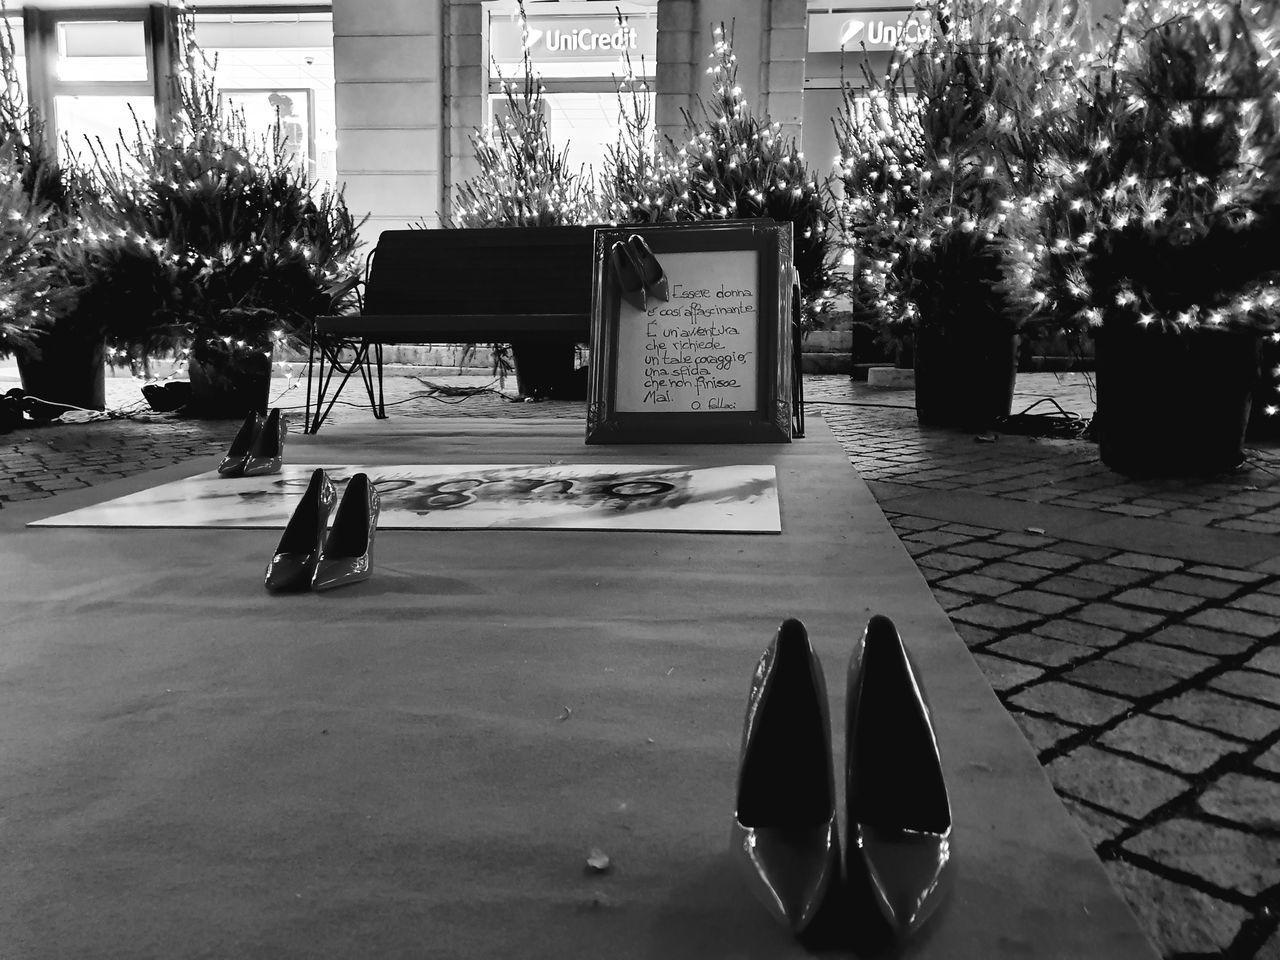 EMPTY SEATS ON FOOTPATH IN CITY